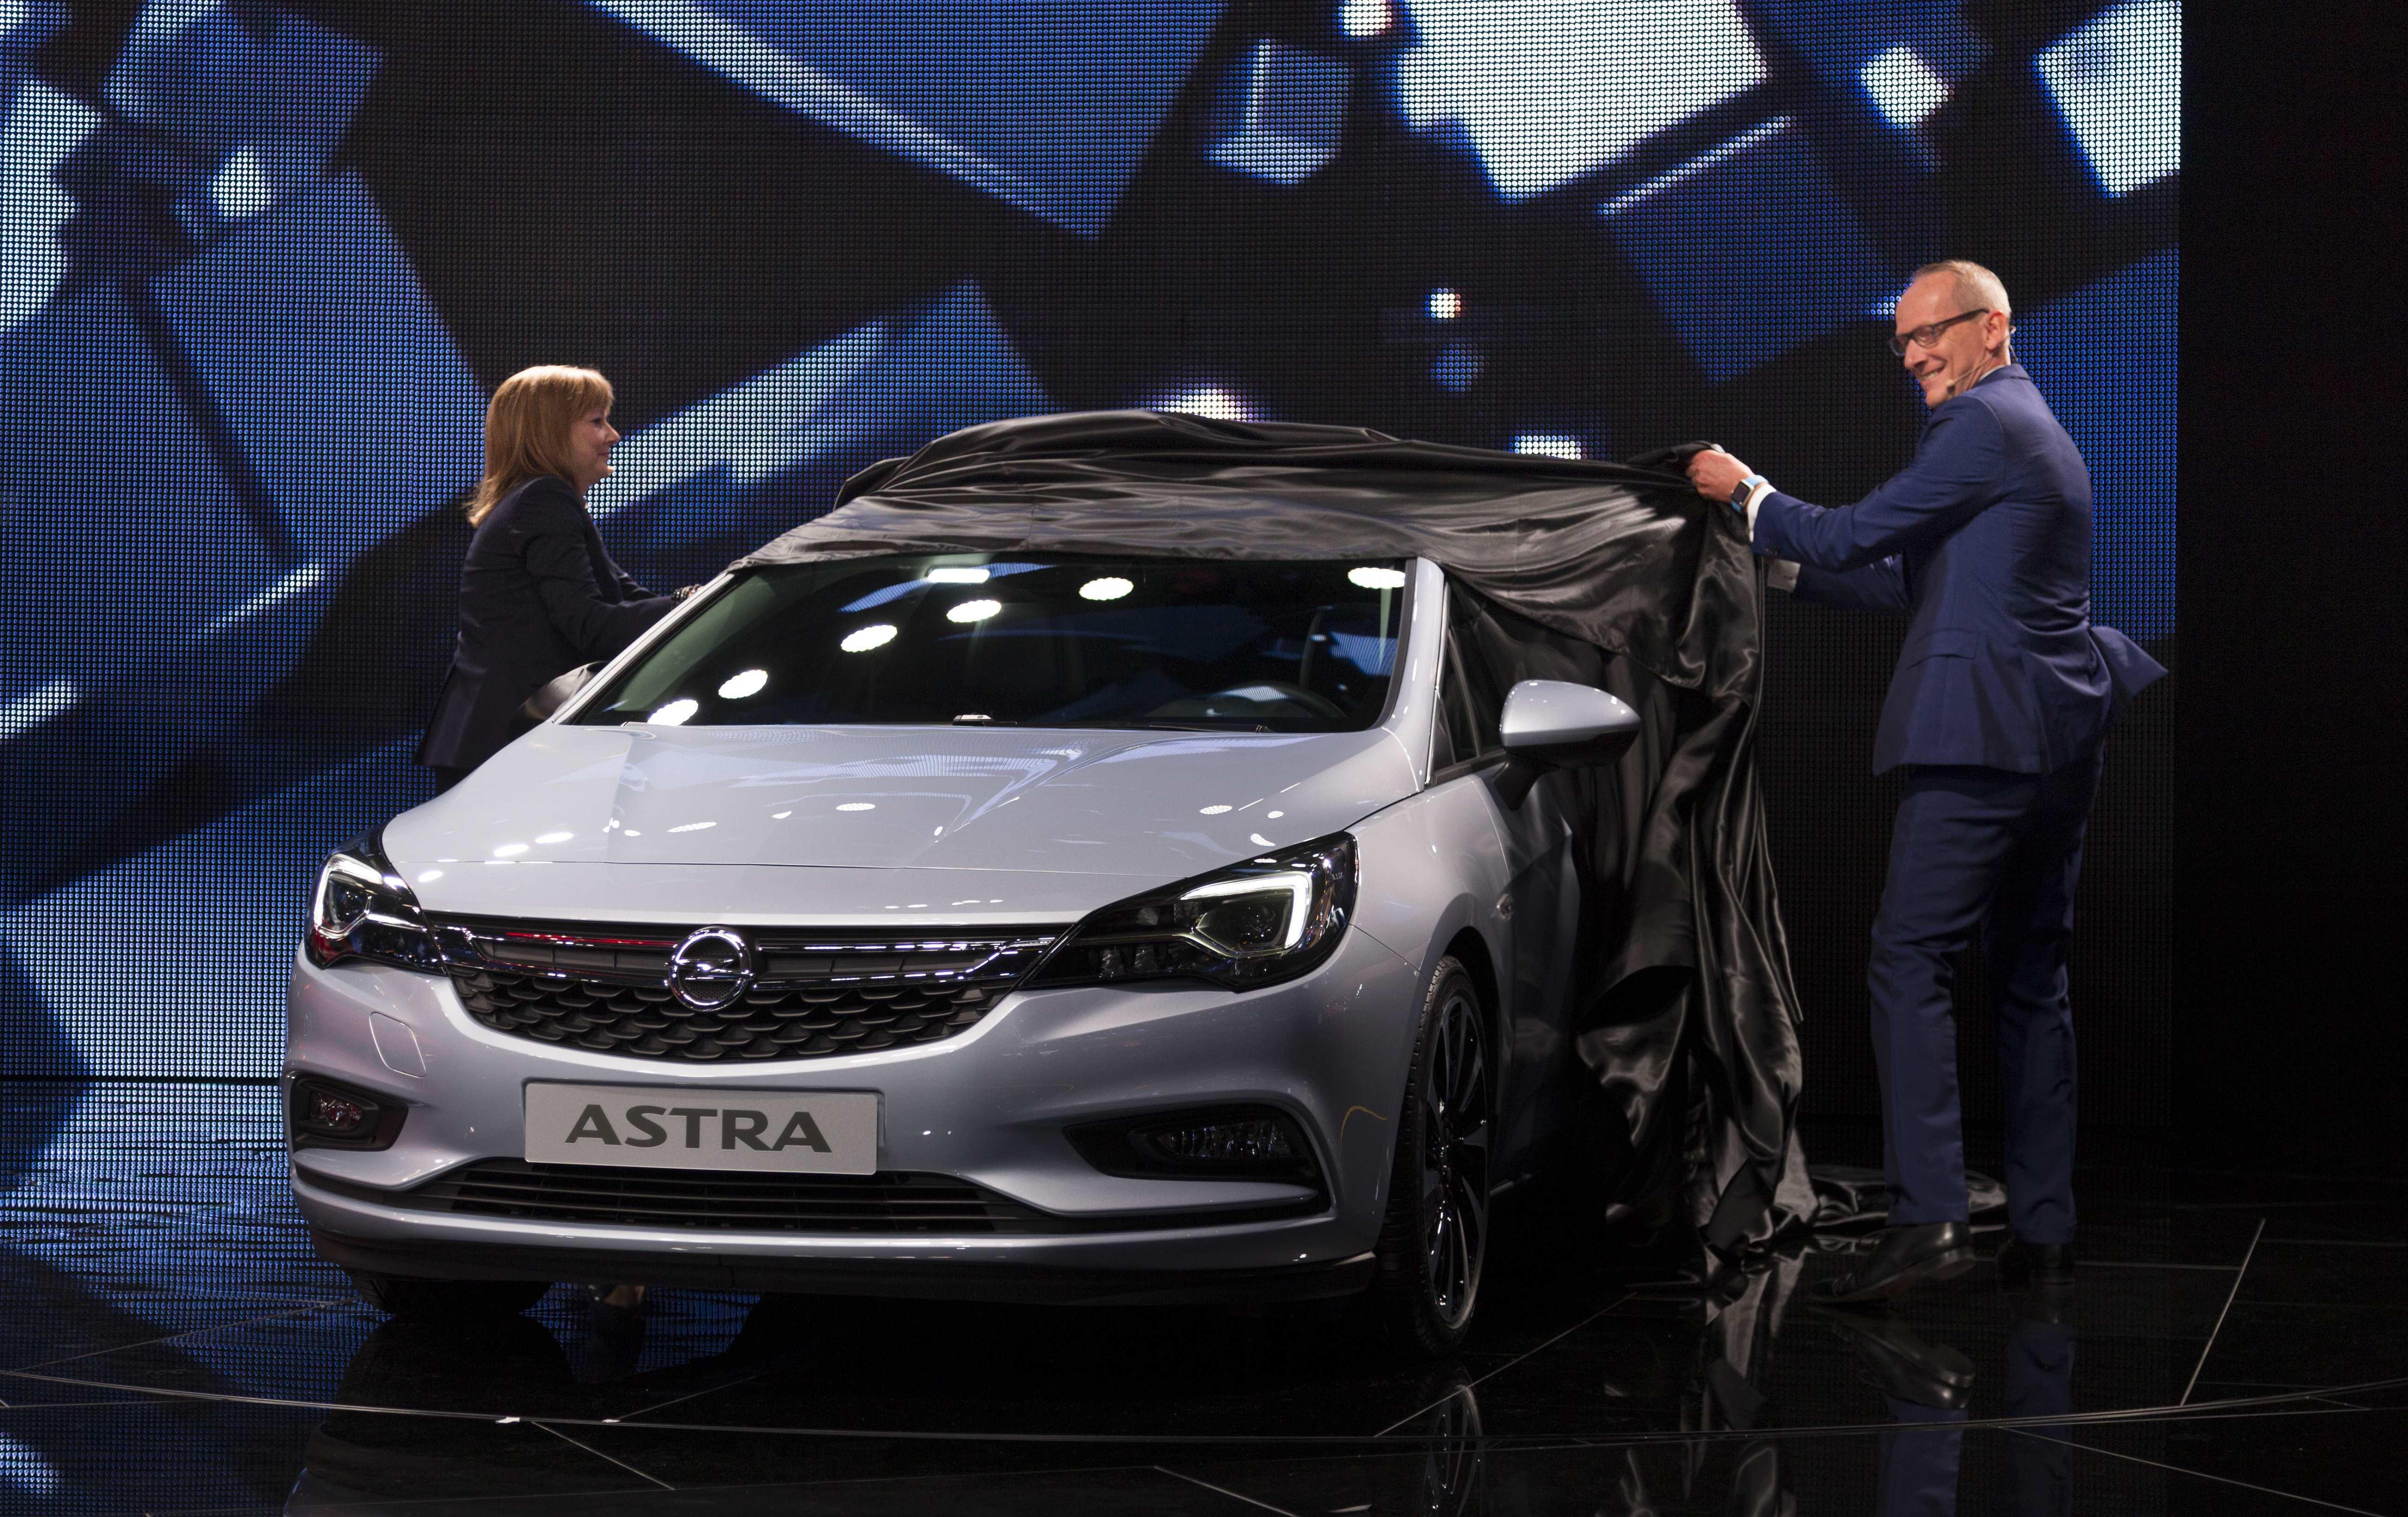 12 New Opel Astra Yeni Kasa 2020 Pricing for Opel Astra Yeni Kasa 2020